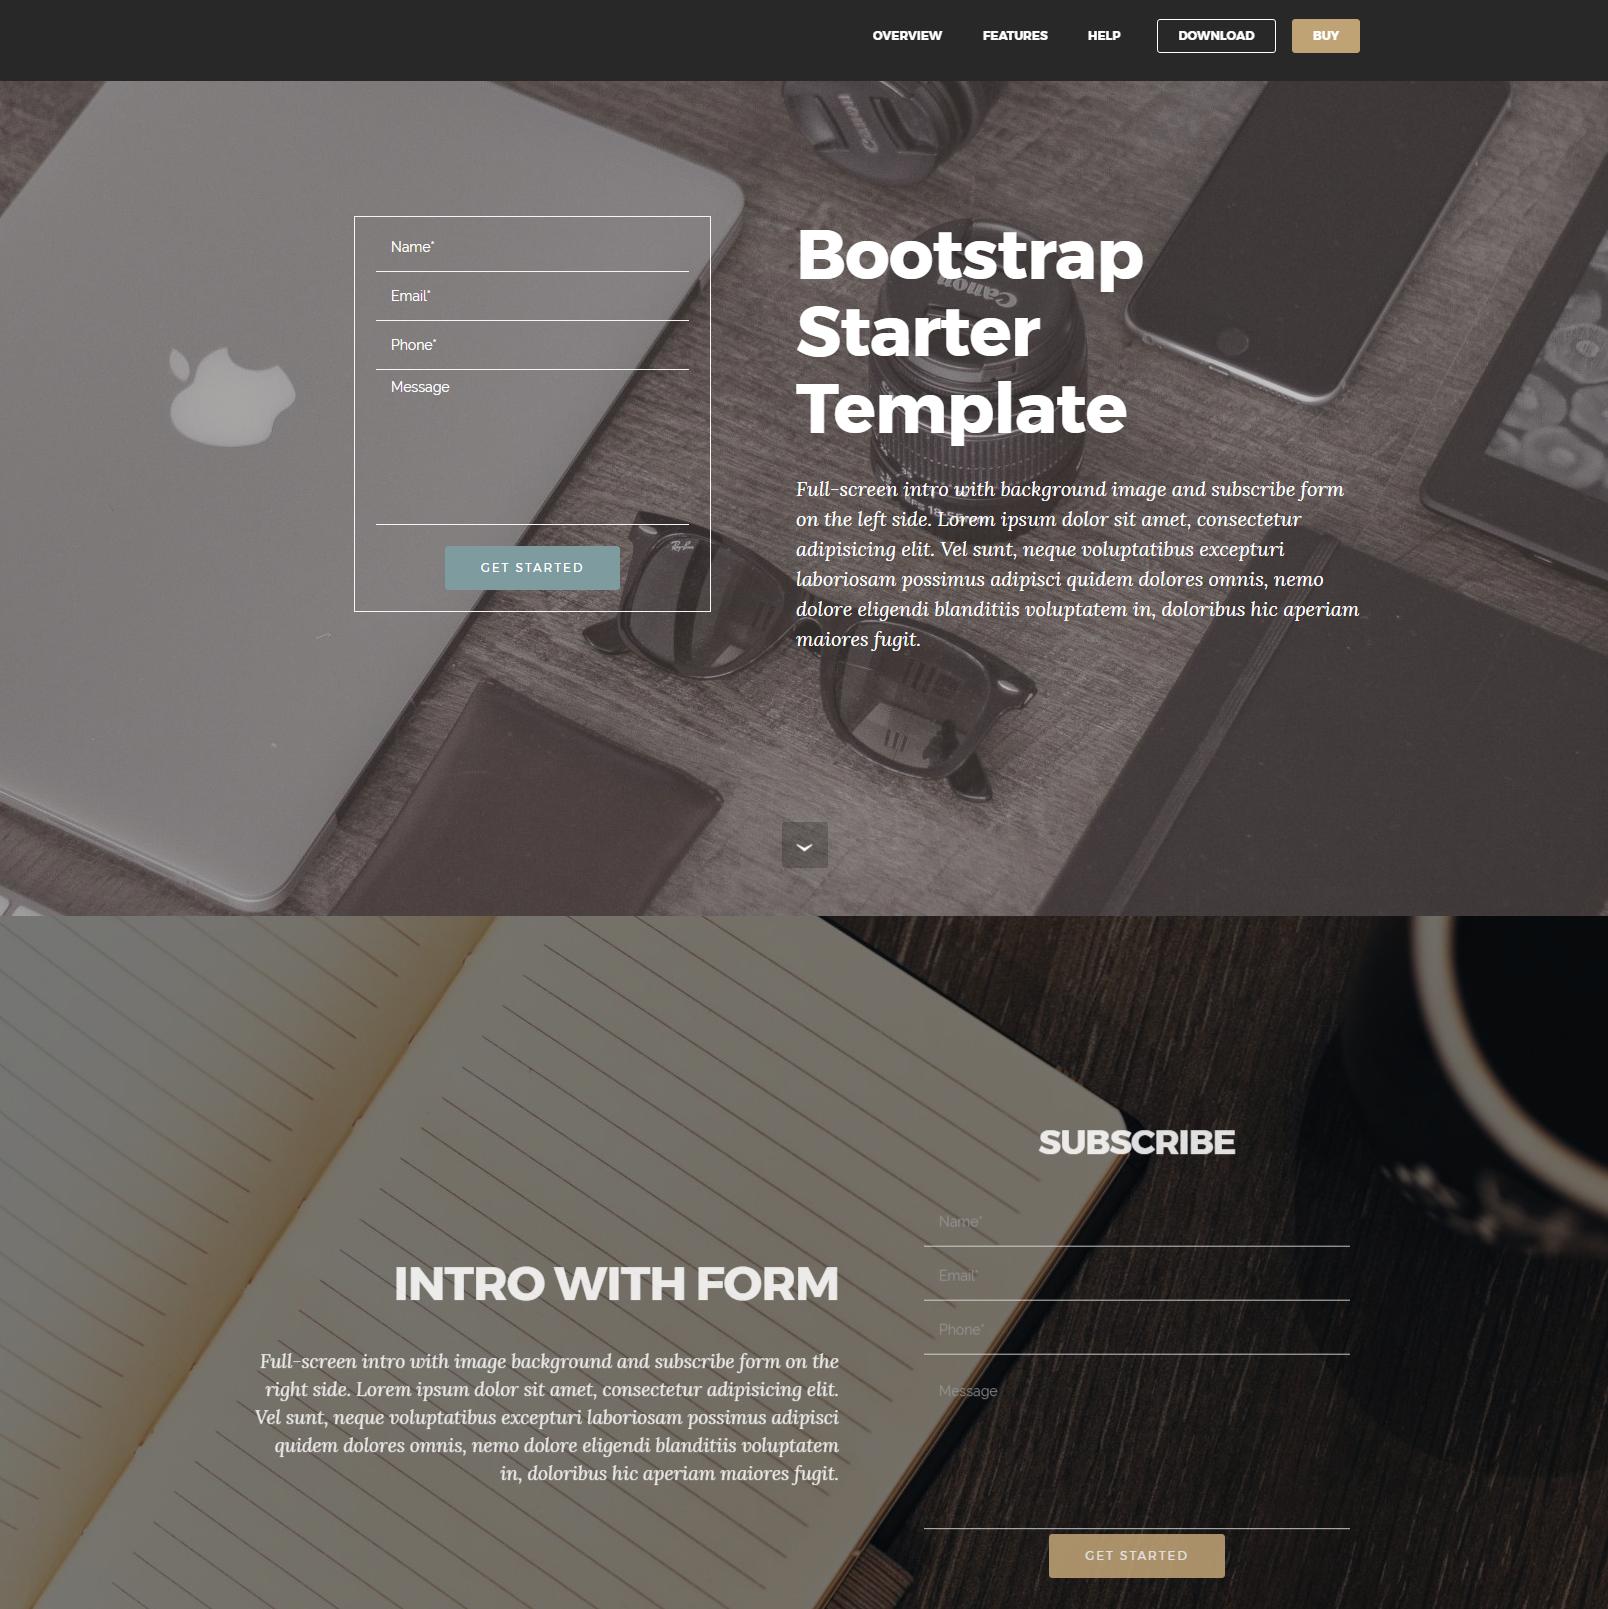 HTML5 Bootstrap Starter Templates